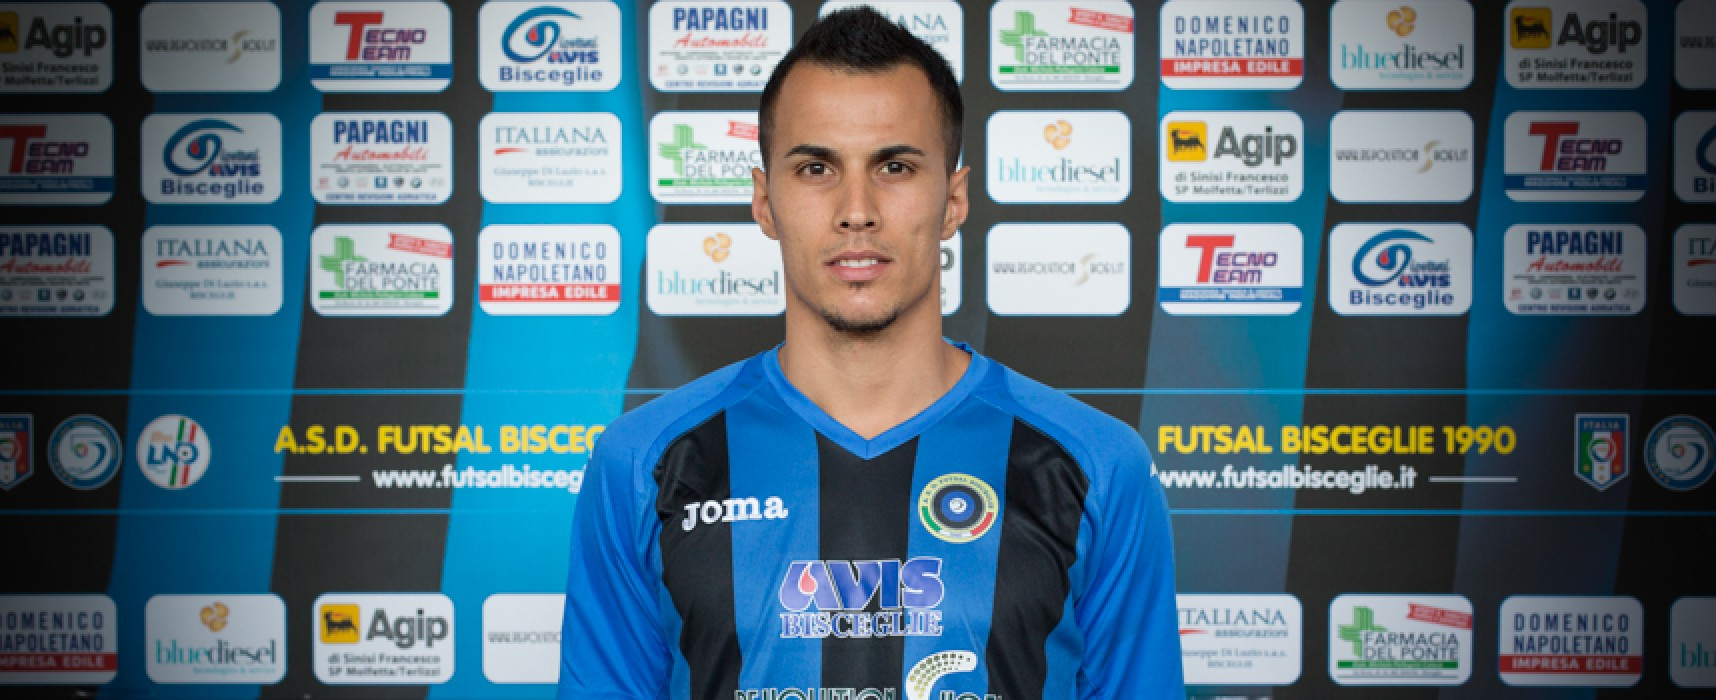 Online gli highlights di Block Stem Cisternino-Futsal Bisceglie 4-3/VIDEO